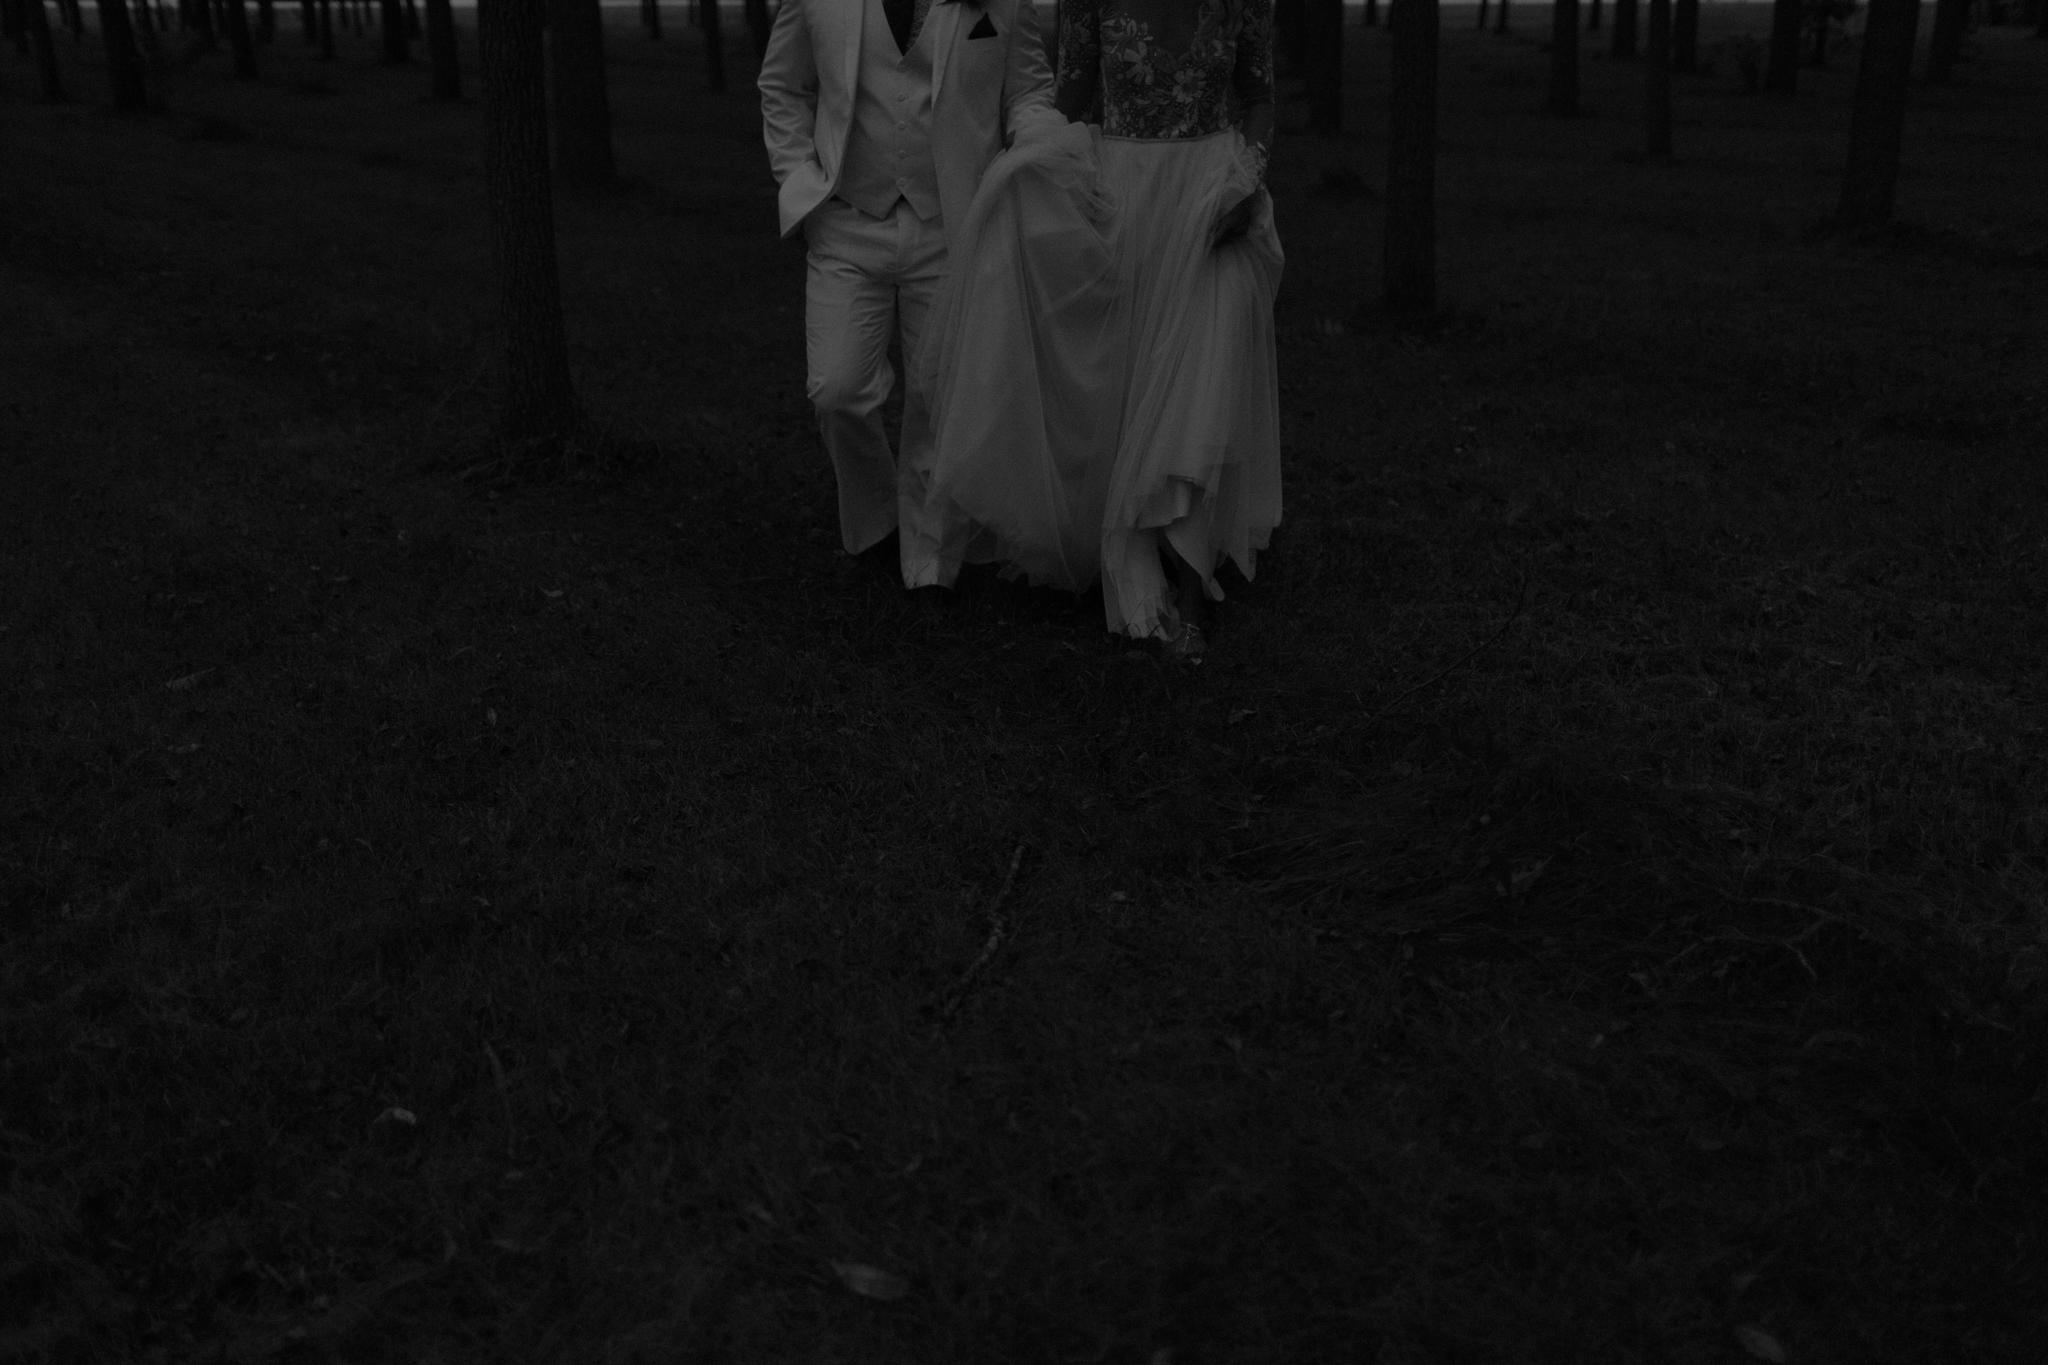 canyon run ranch wedding bohemian wedding photographer ohio bohemian wedding dayton ohio wedding photographer columbus ohio wedding photographer sarah rose hayley paige wedding gown